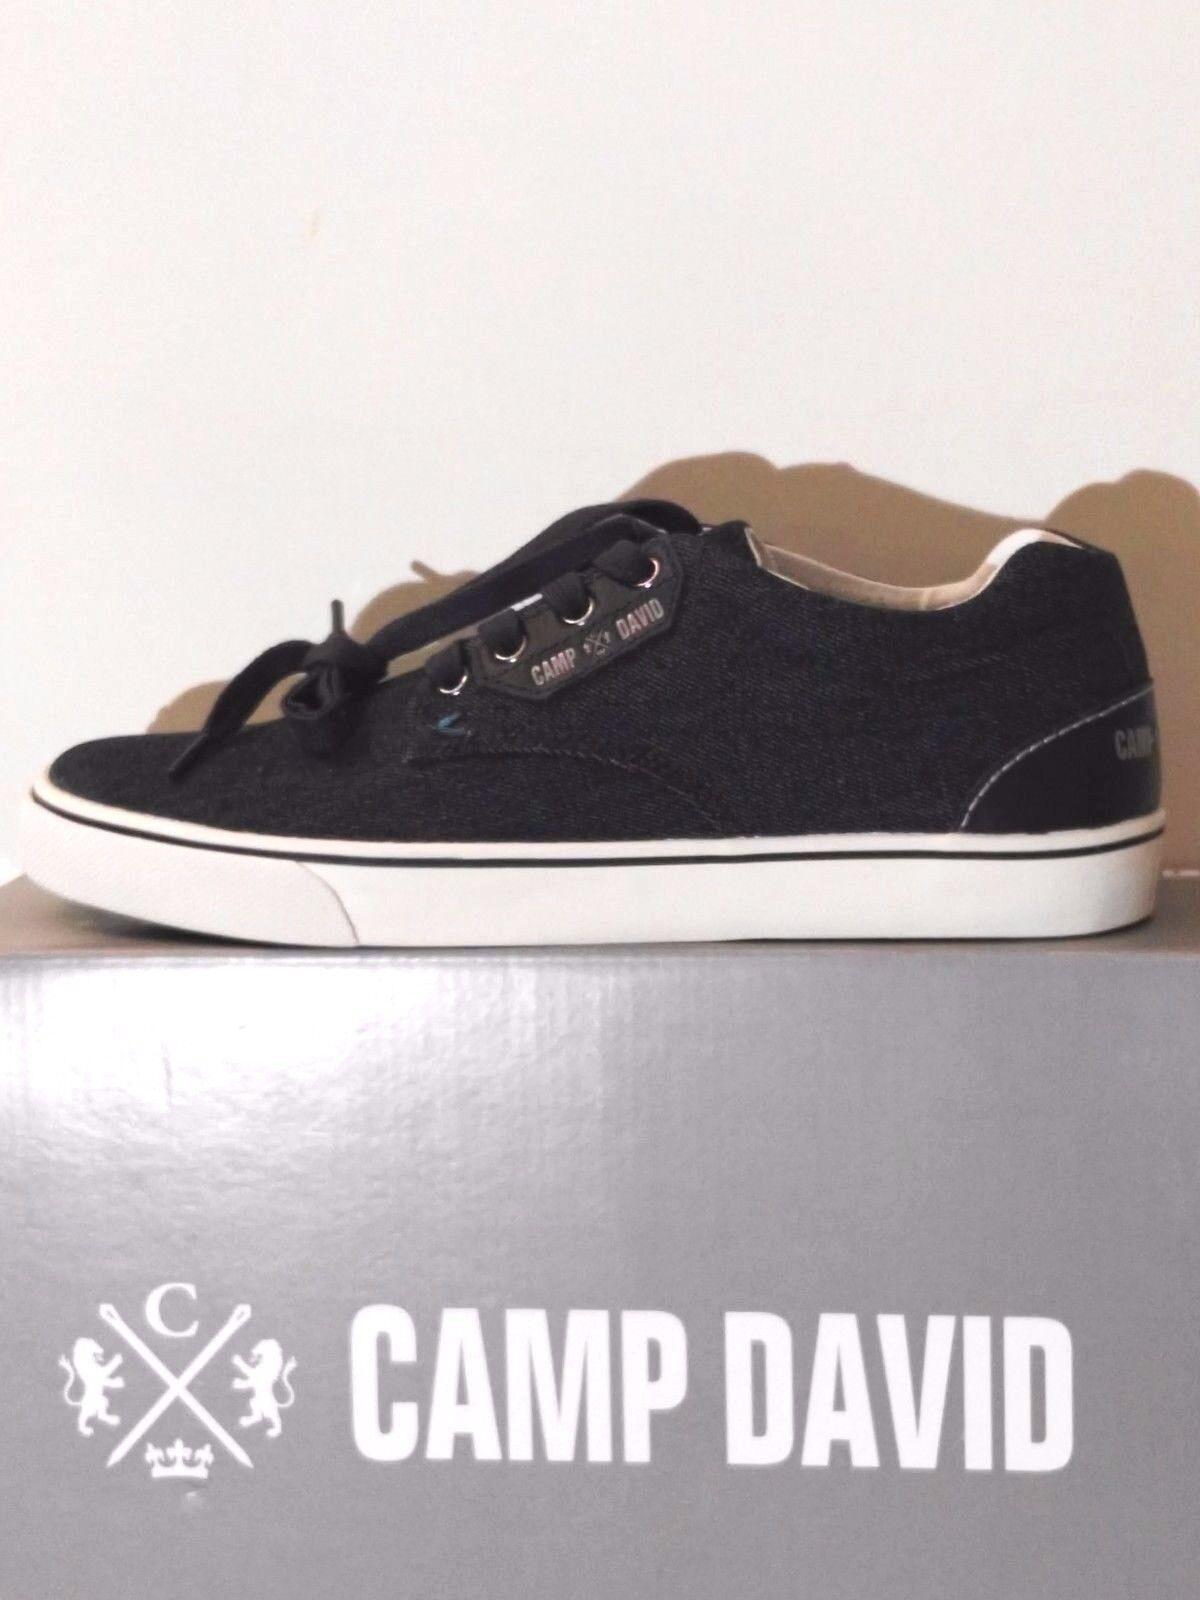 CAMP CAMP CAMP DAVID,Man ,Turnschuhe,RABATT 30%%%  Blau Navy,1755-8207,Original.  f64180